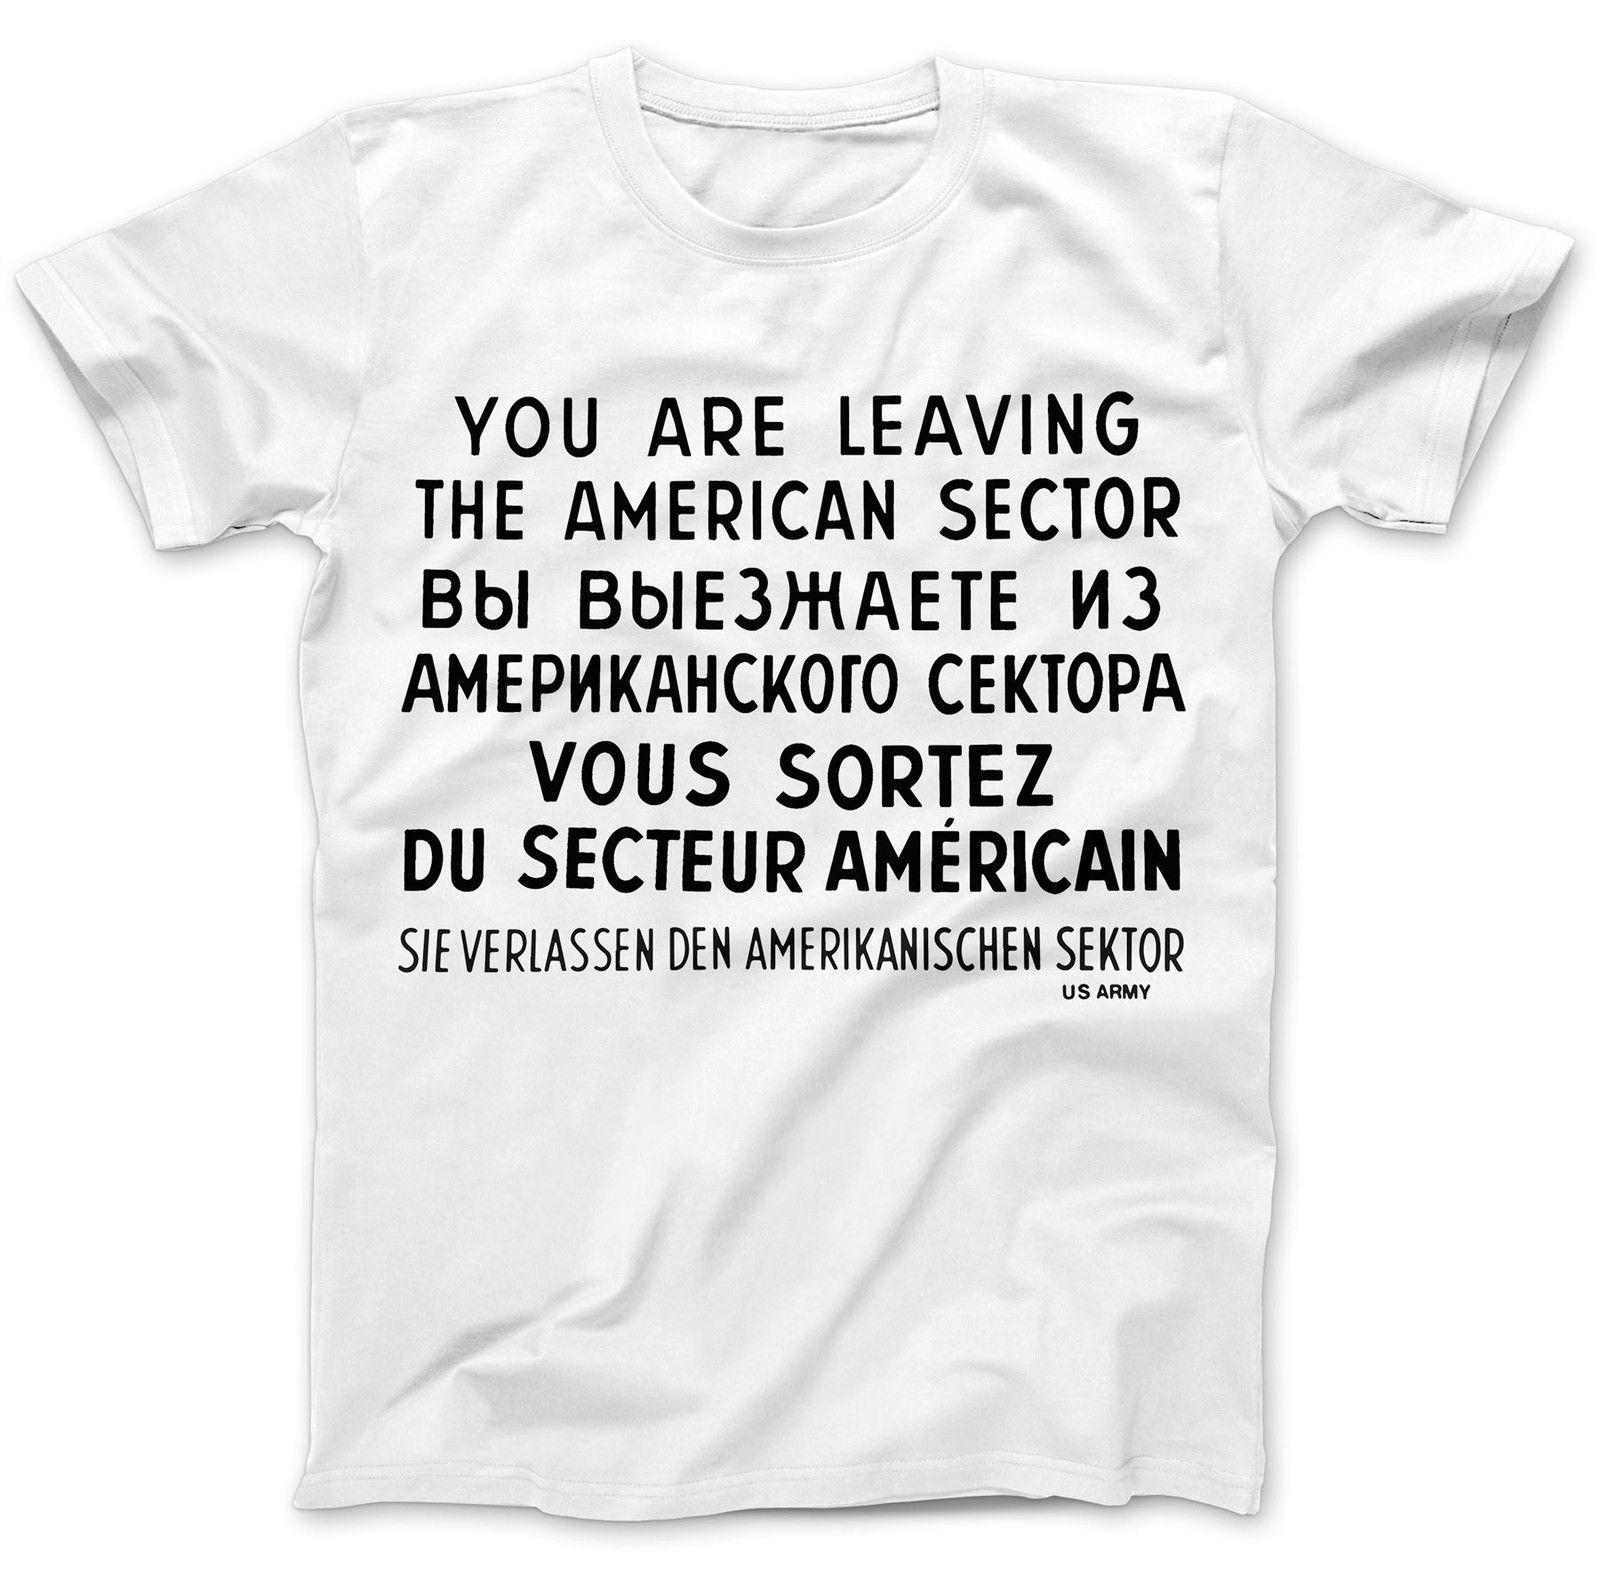 Checkpoint Чарли Берлин футболка 100% хлопка Премиум WW2 коммунизм мужские Hipster корот ...